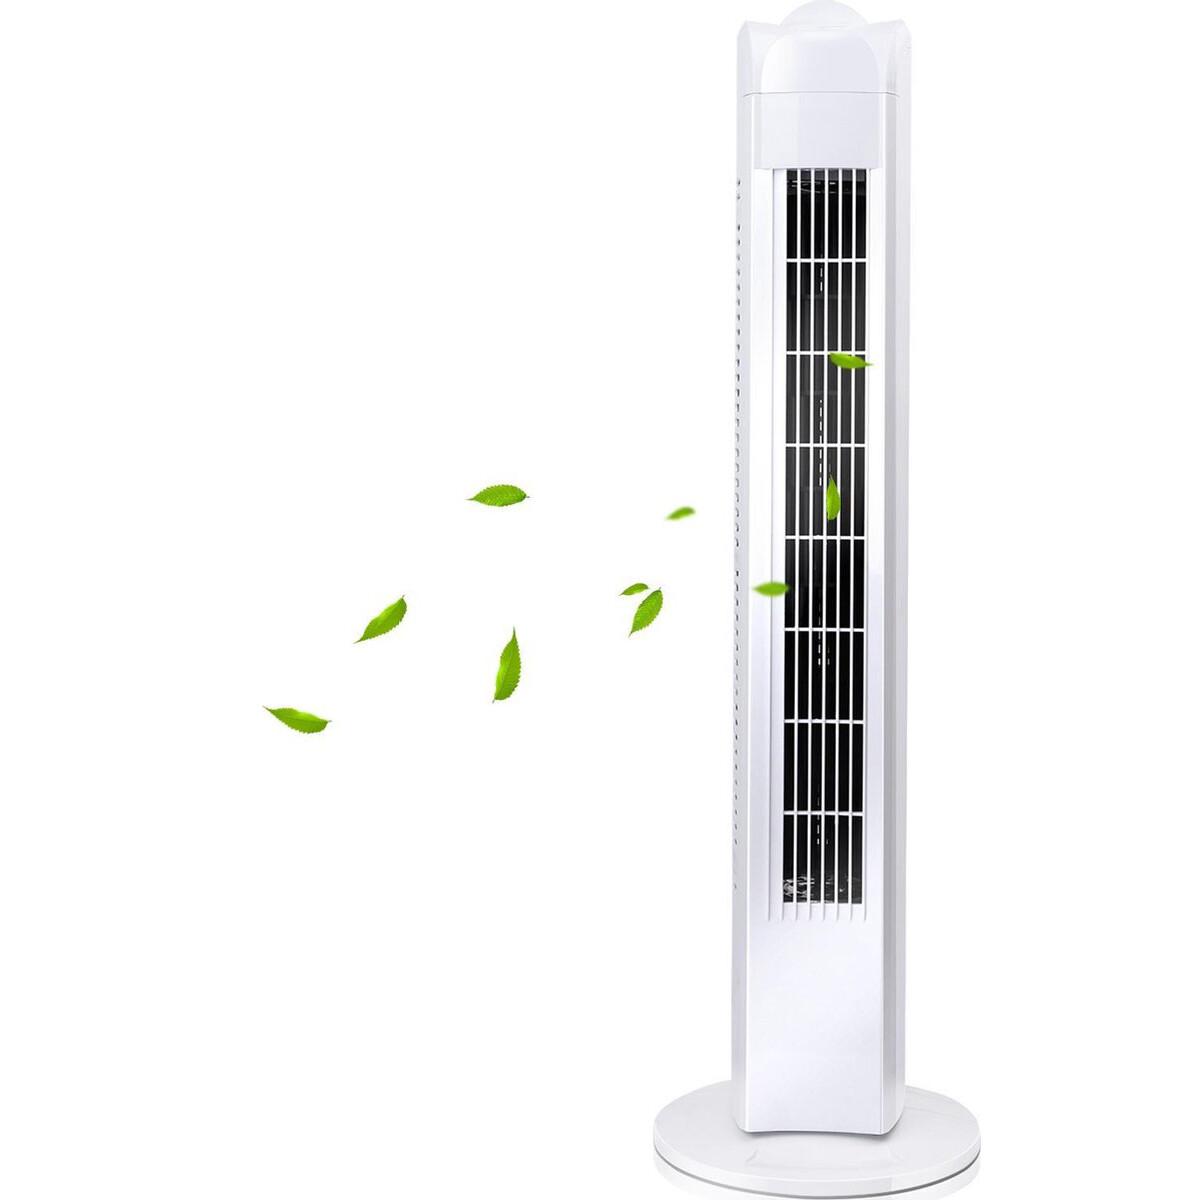 Ventilator - Aigi Bivon - Torenventilator - Staand - Rond - Mat Wit - Kunststof